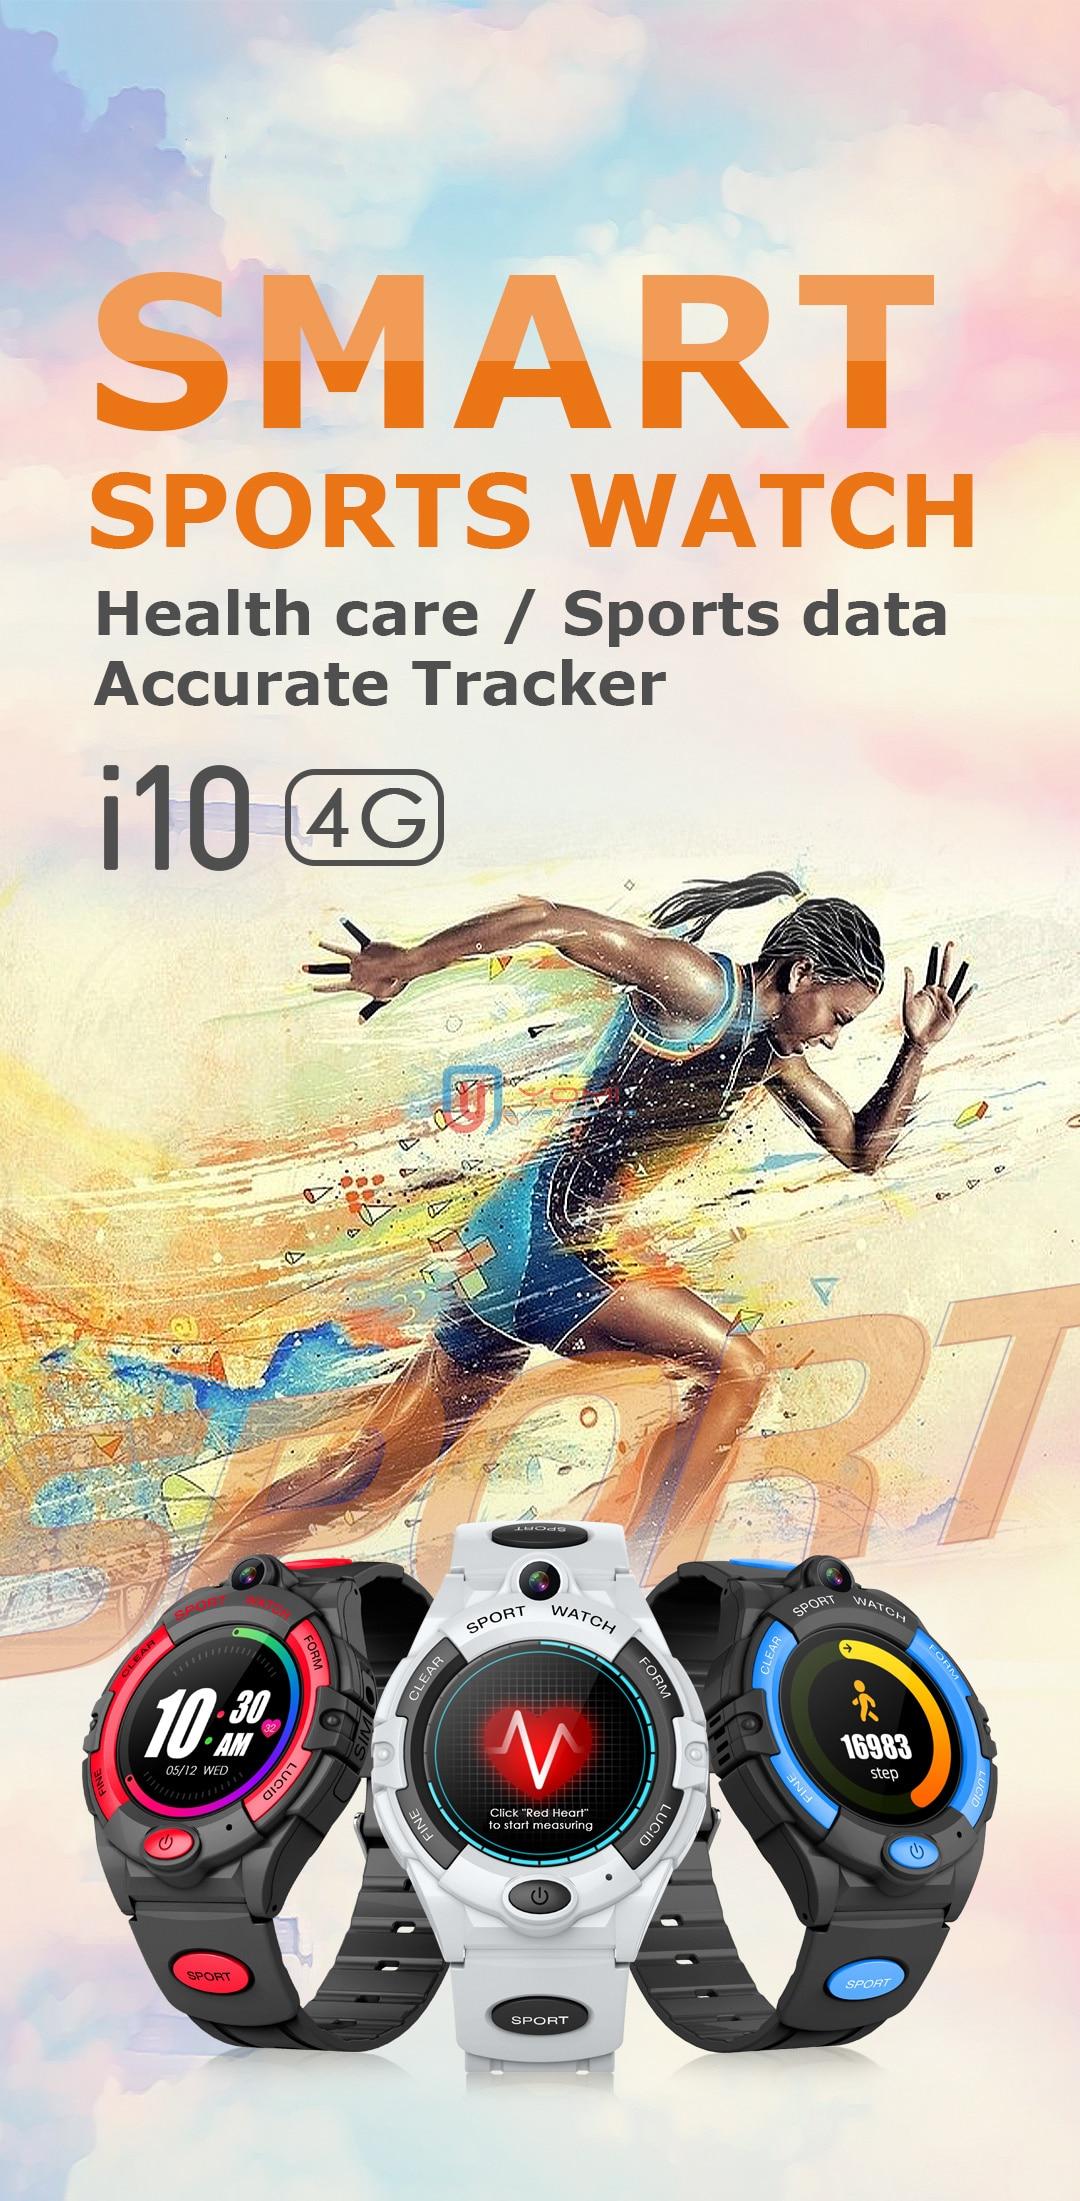 wi-fi tracker câmera monitor remoto chamada sos telefone smartwatch